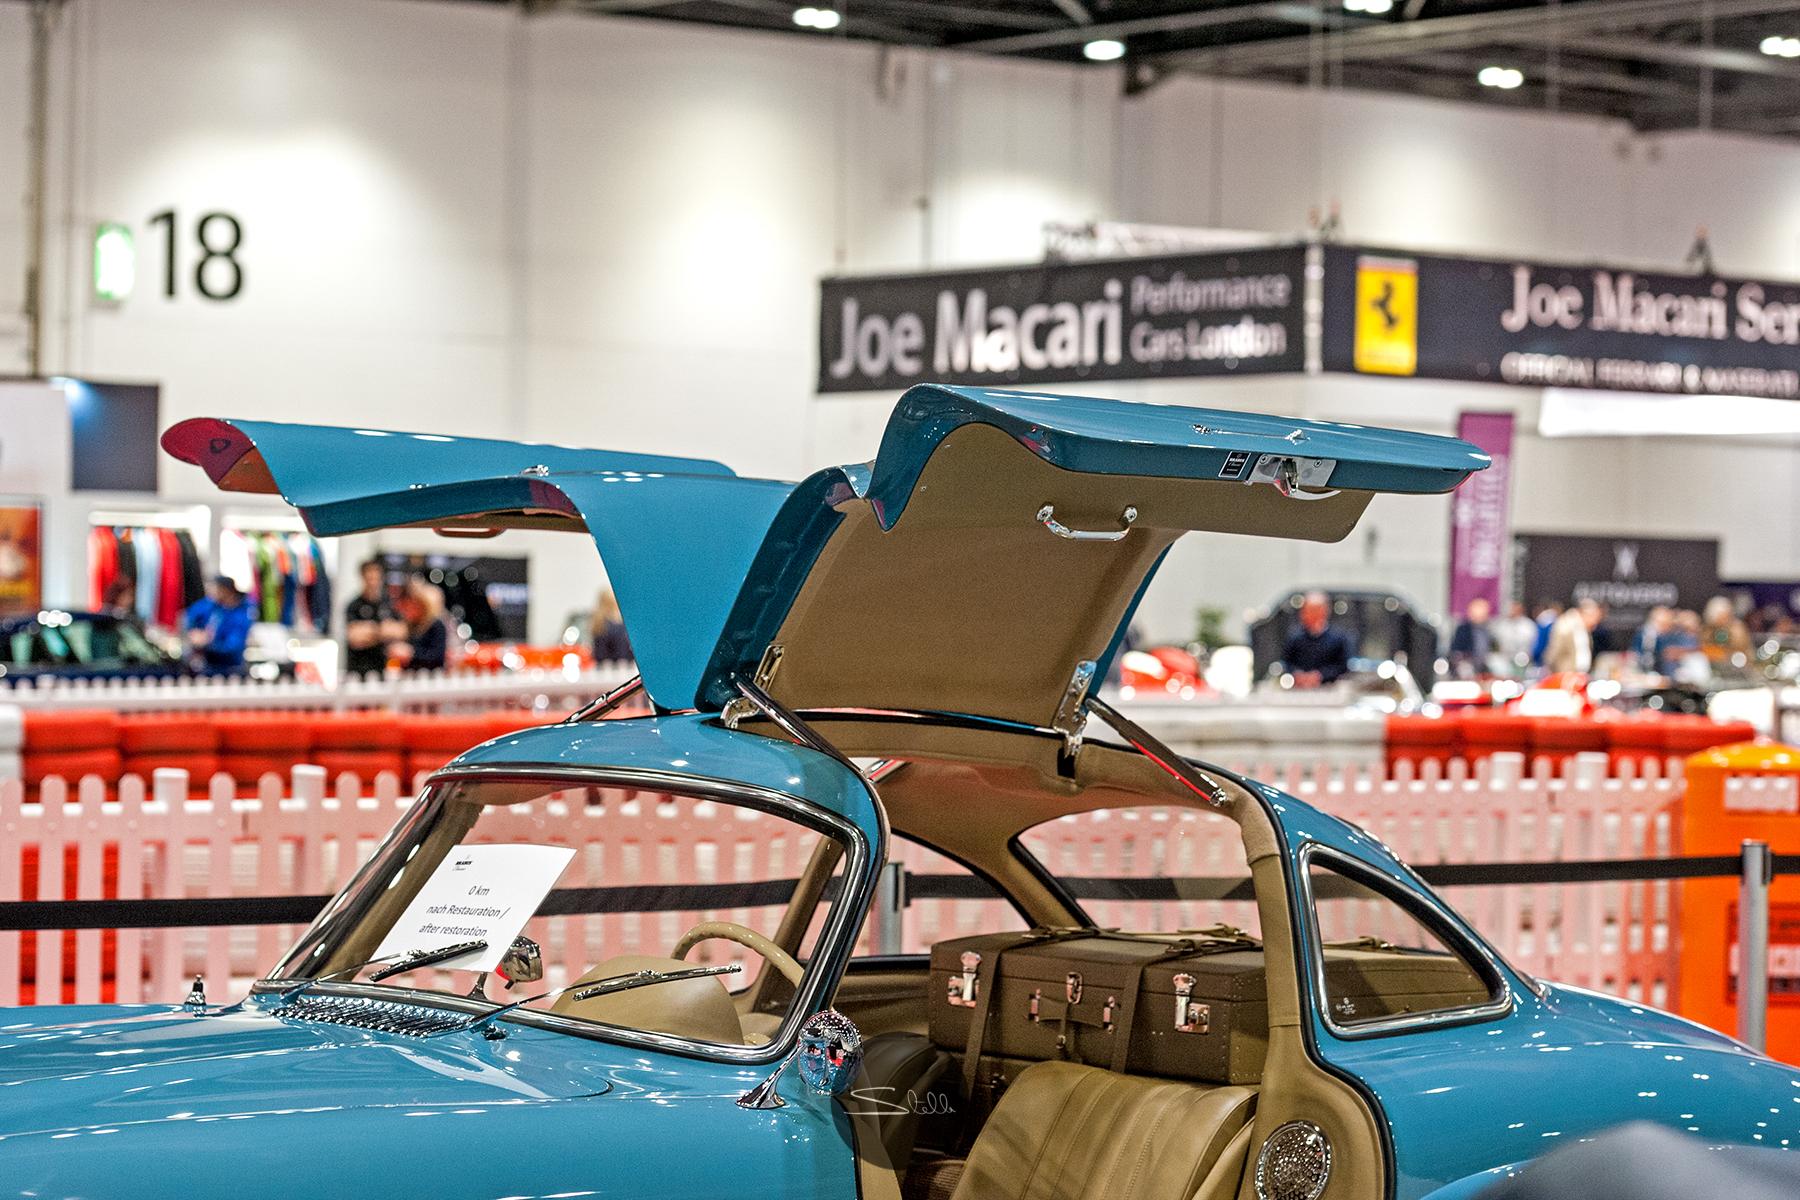 Stella Scordellis London Classic Car Show 2017 14 Watermarked.jpg